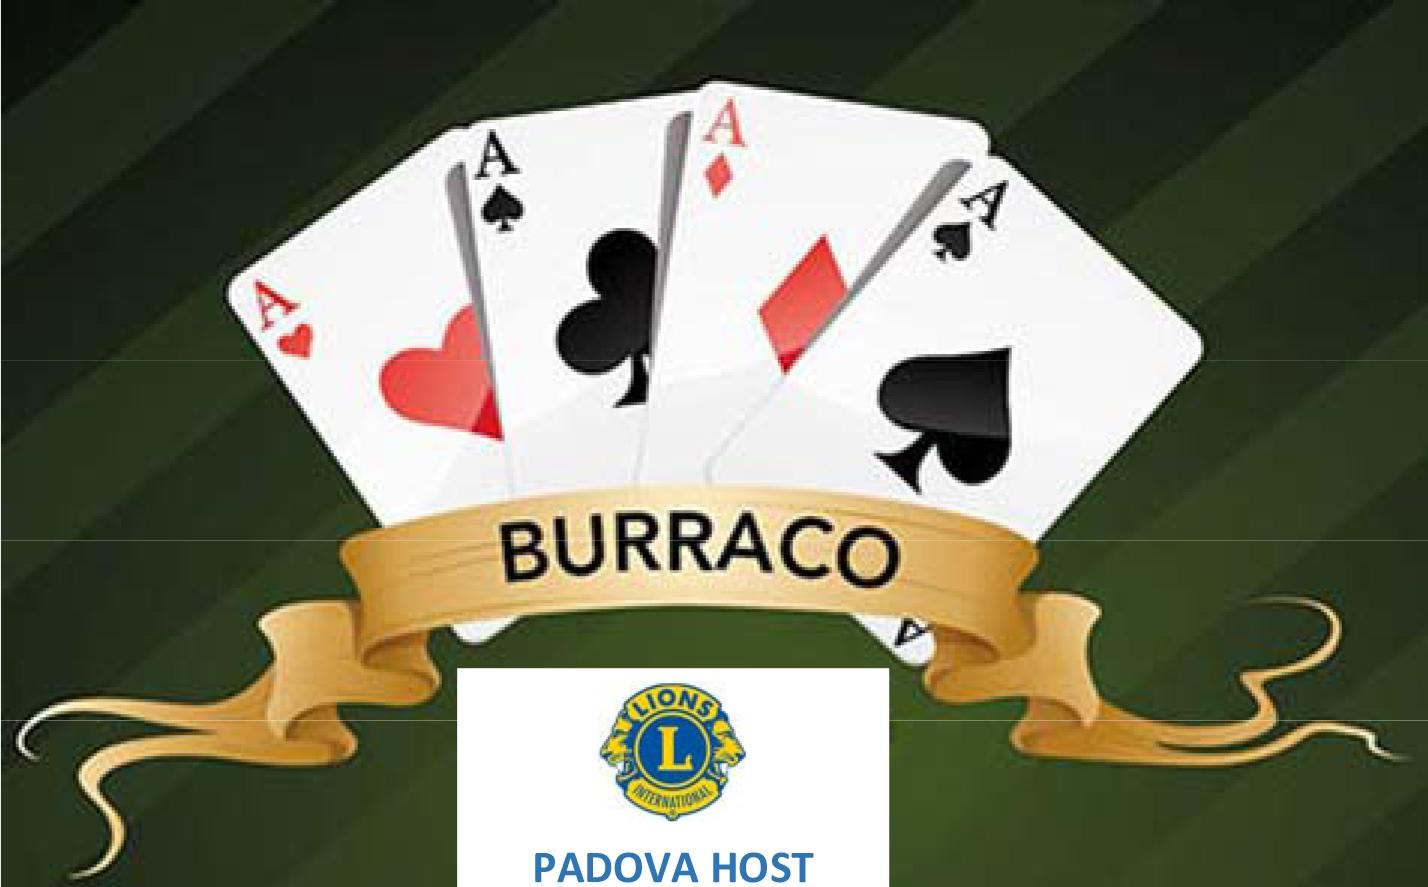 PADOVA HOST: 2° Torneo di Burraco